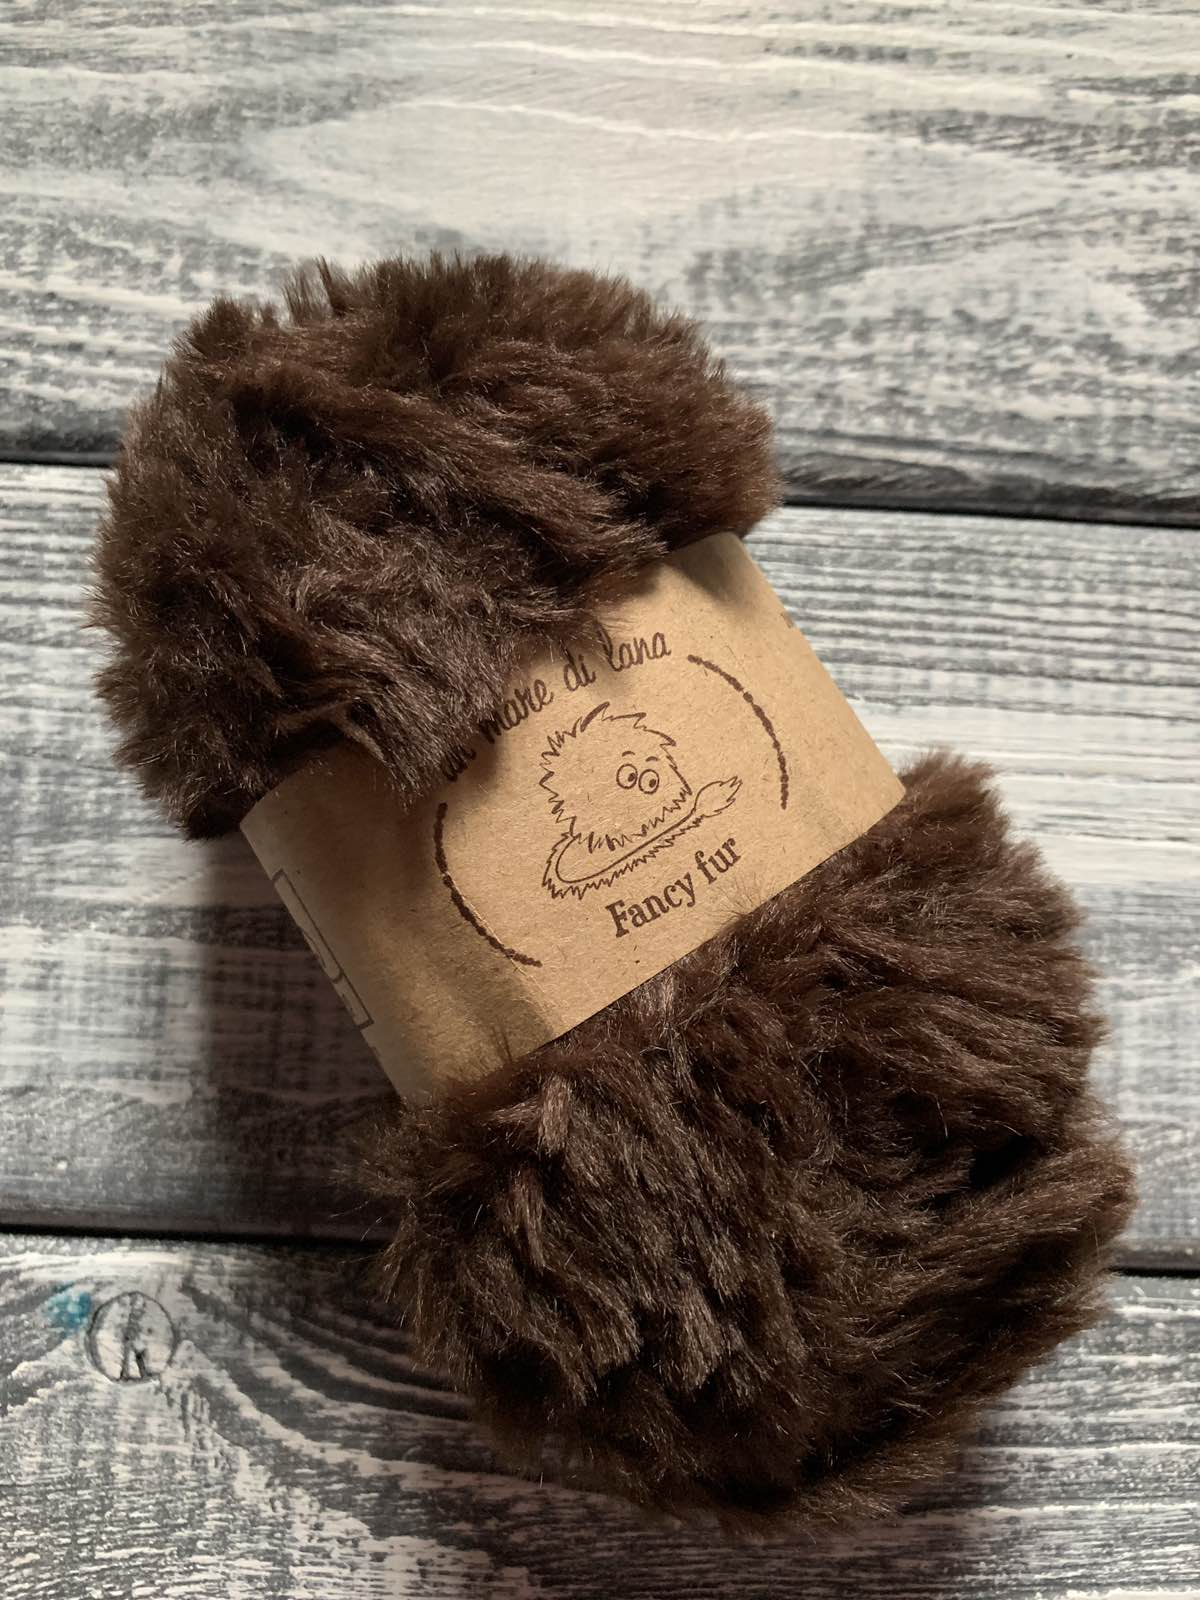 Wool Sea Fancy fur (Море шерсти Фанси фе ) 17 - шоколад купить со скидкой в Беларуси